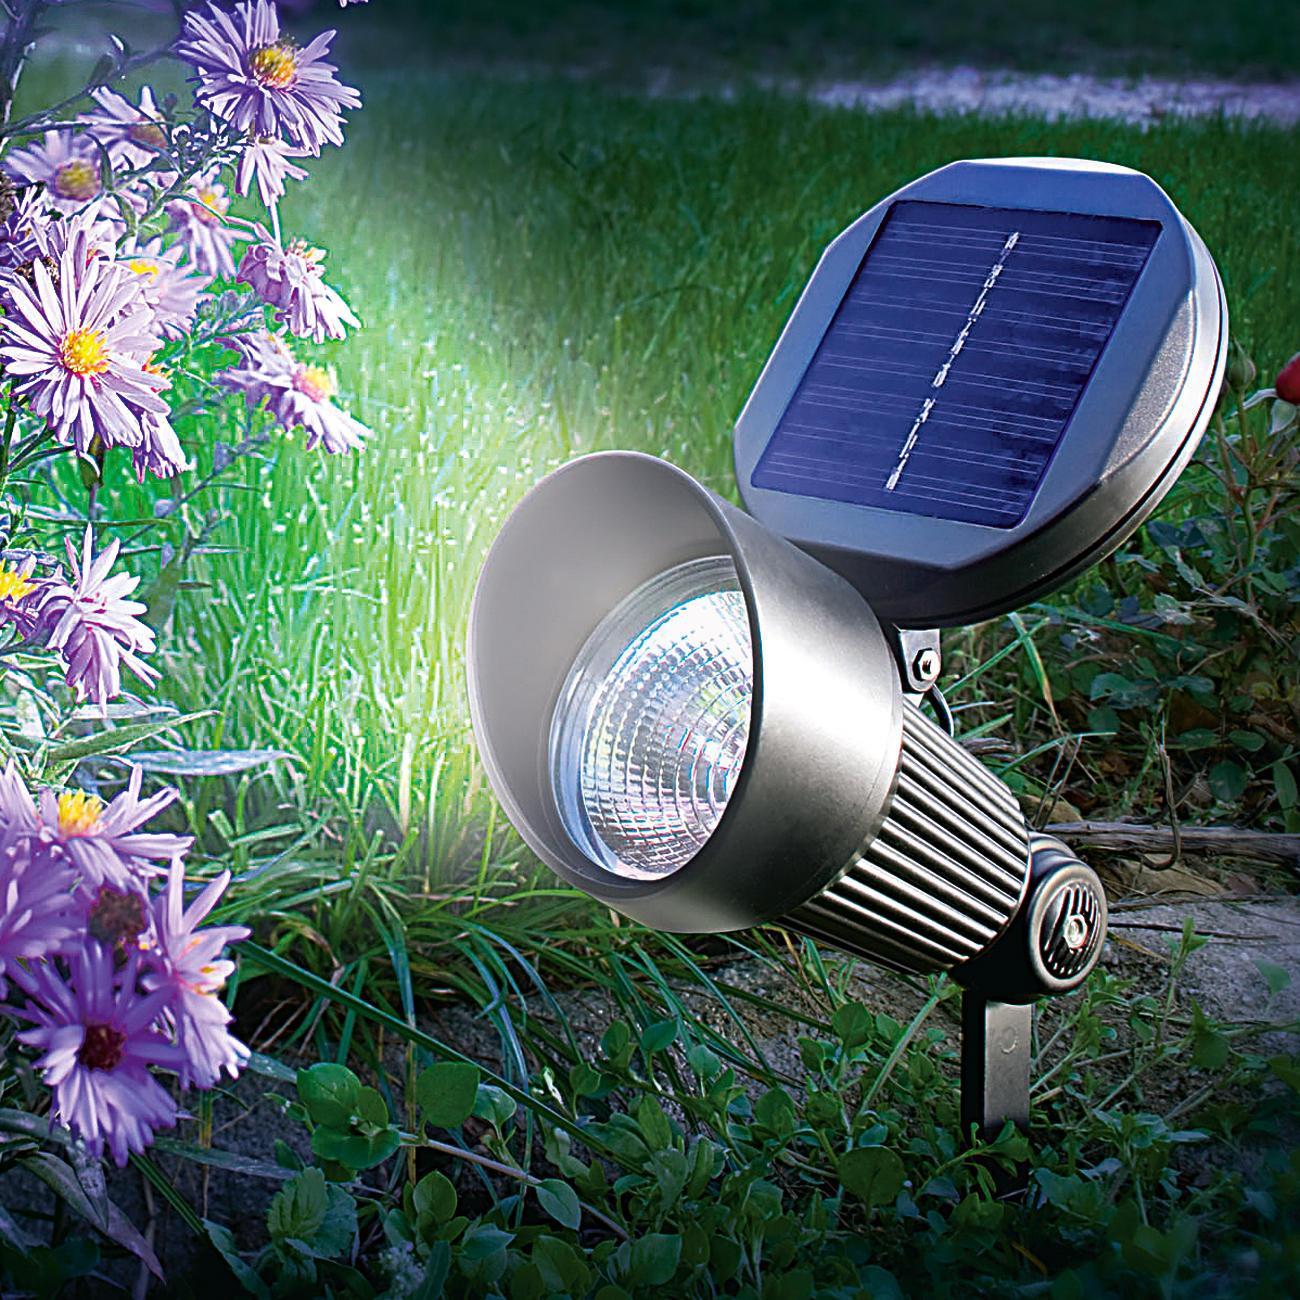 solar spotlight 3 jaar productgarantie pro idee. Black Bedroom Furniture Sets. Home Design Ideas